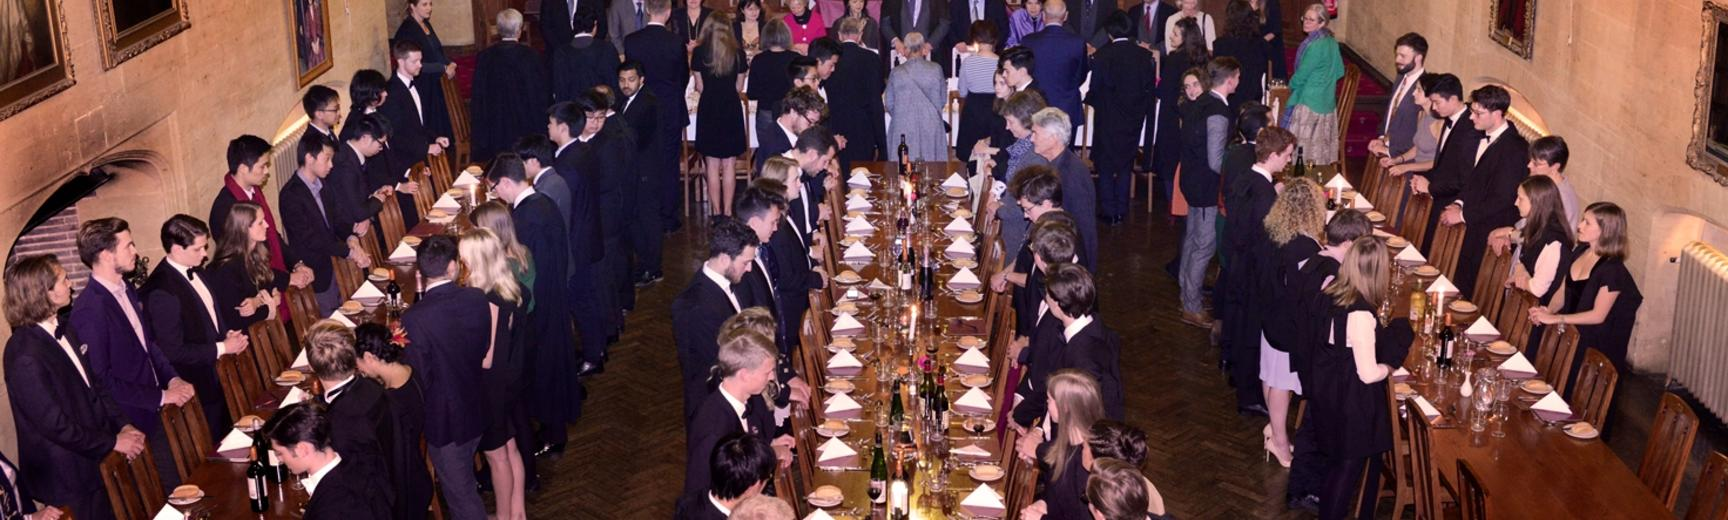 formal dinner hm copy